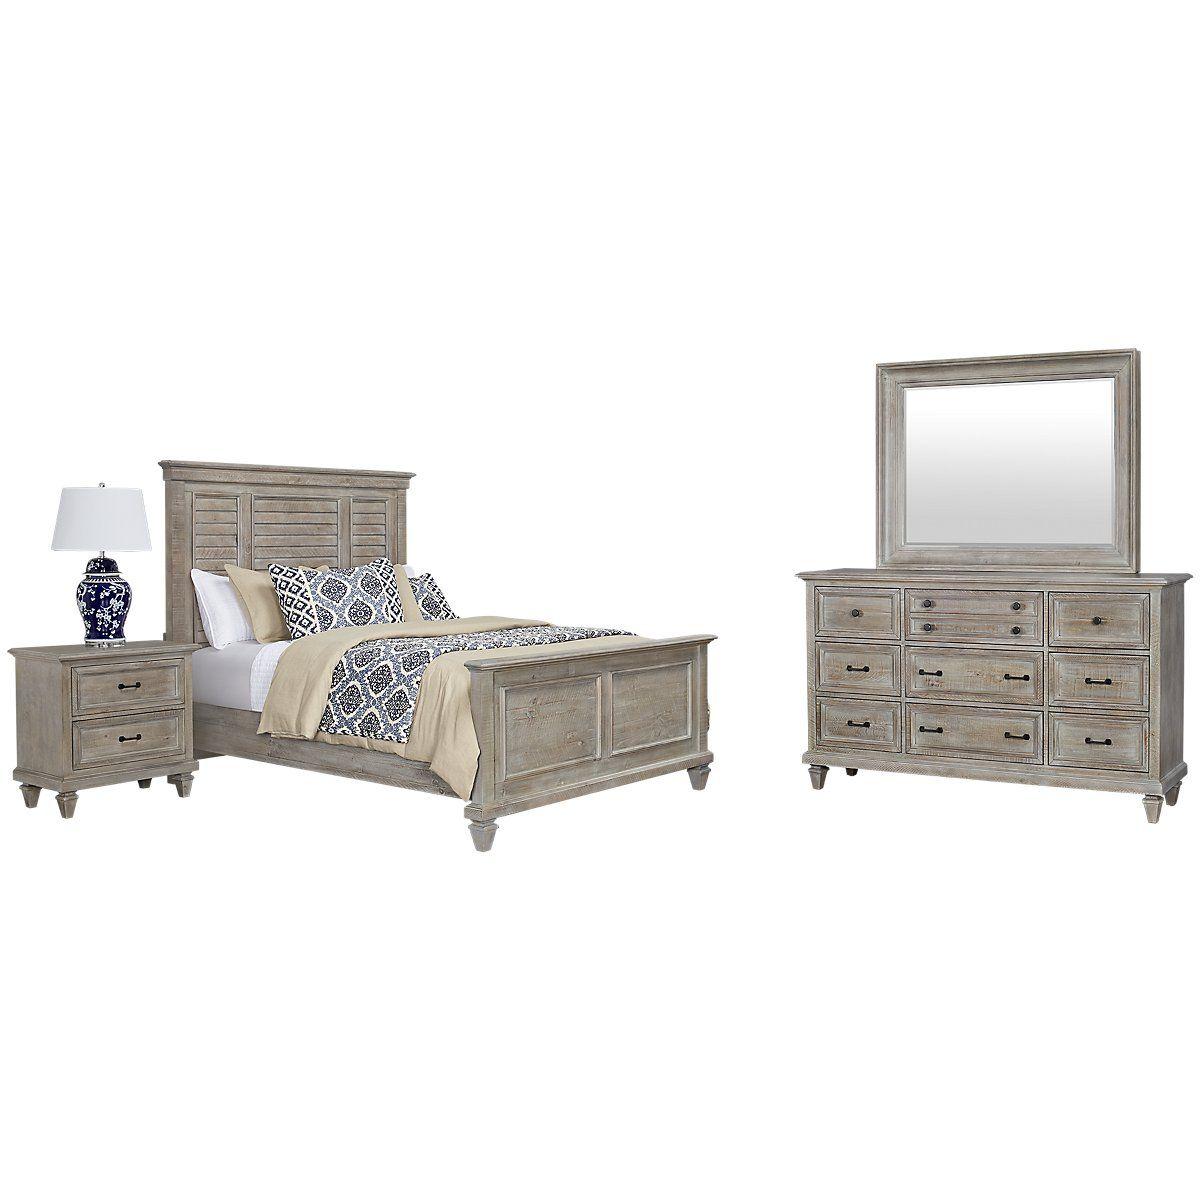 City Furniture Sonoma Light Tone Panel Bedroom Bedroom Panel Bedroom Sets Bedroom